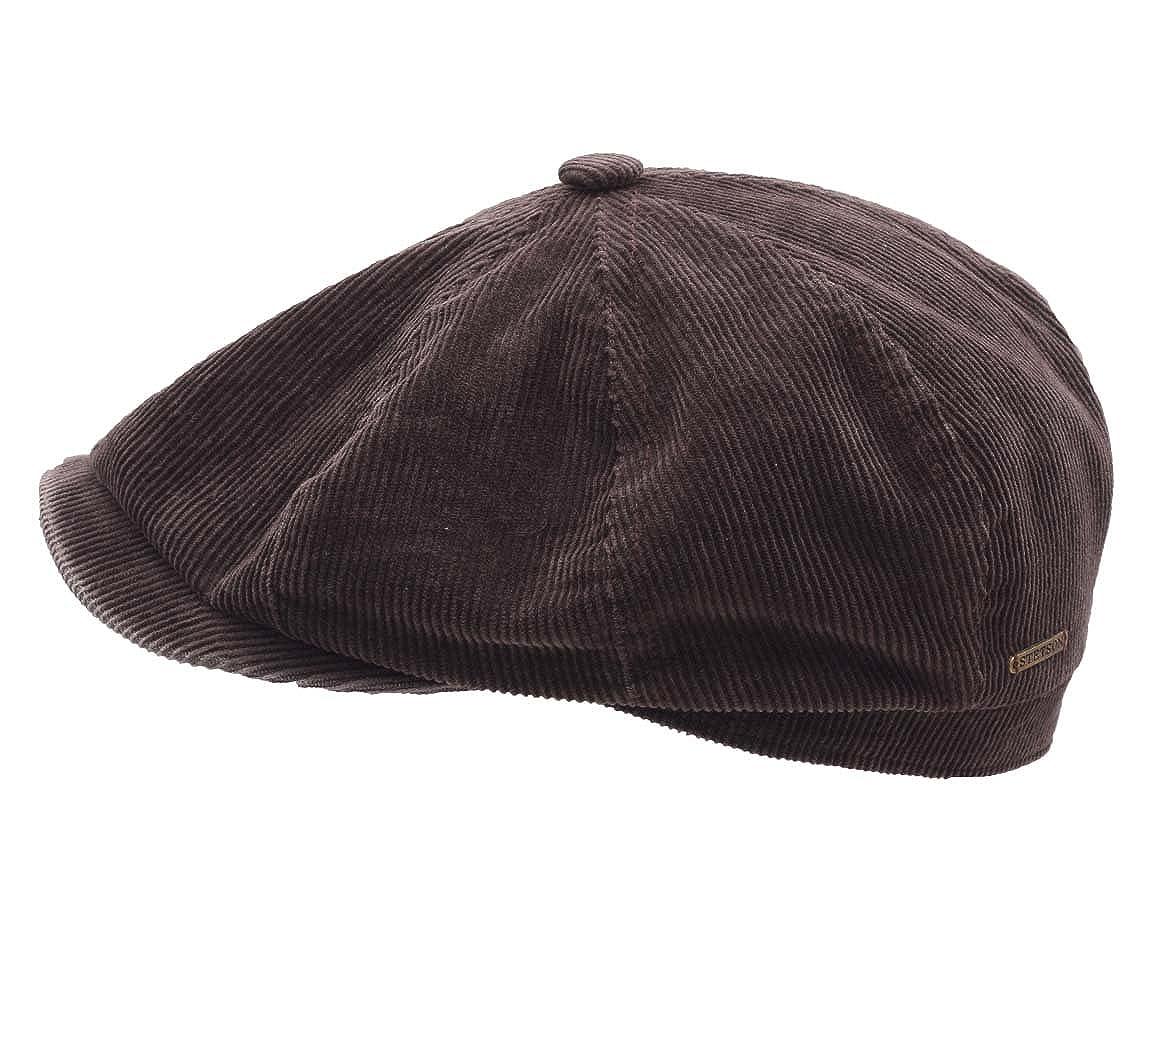 Stetson Men s Hatteras Corduroy Flat Cap Size S at Amazon Men s Clothing  store  9022b0e1b5c